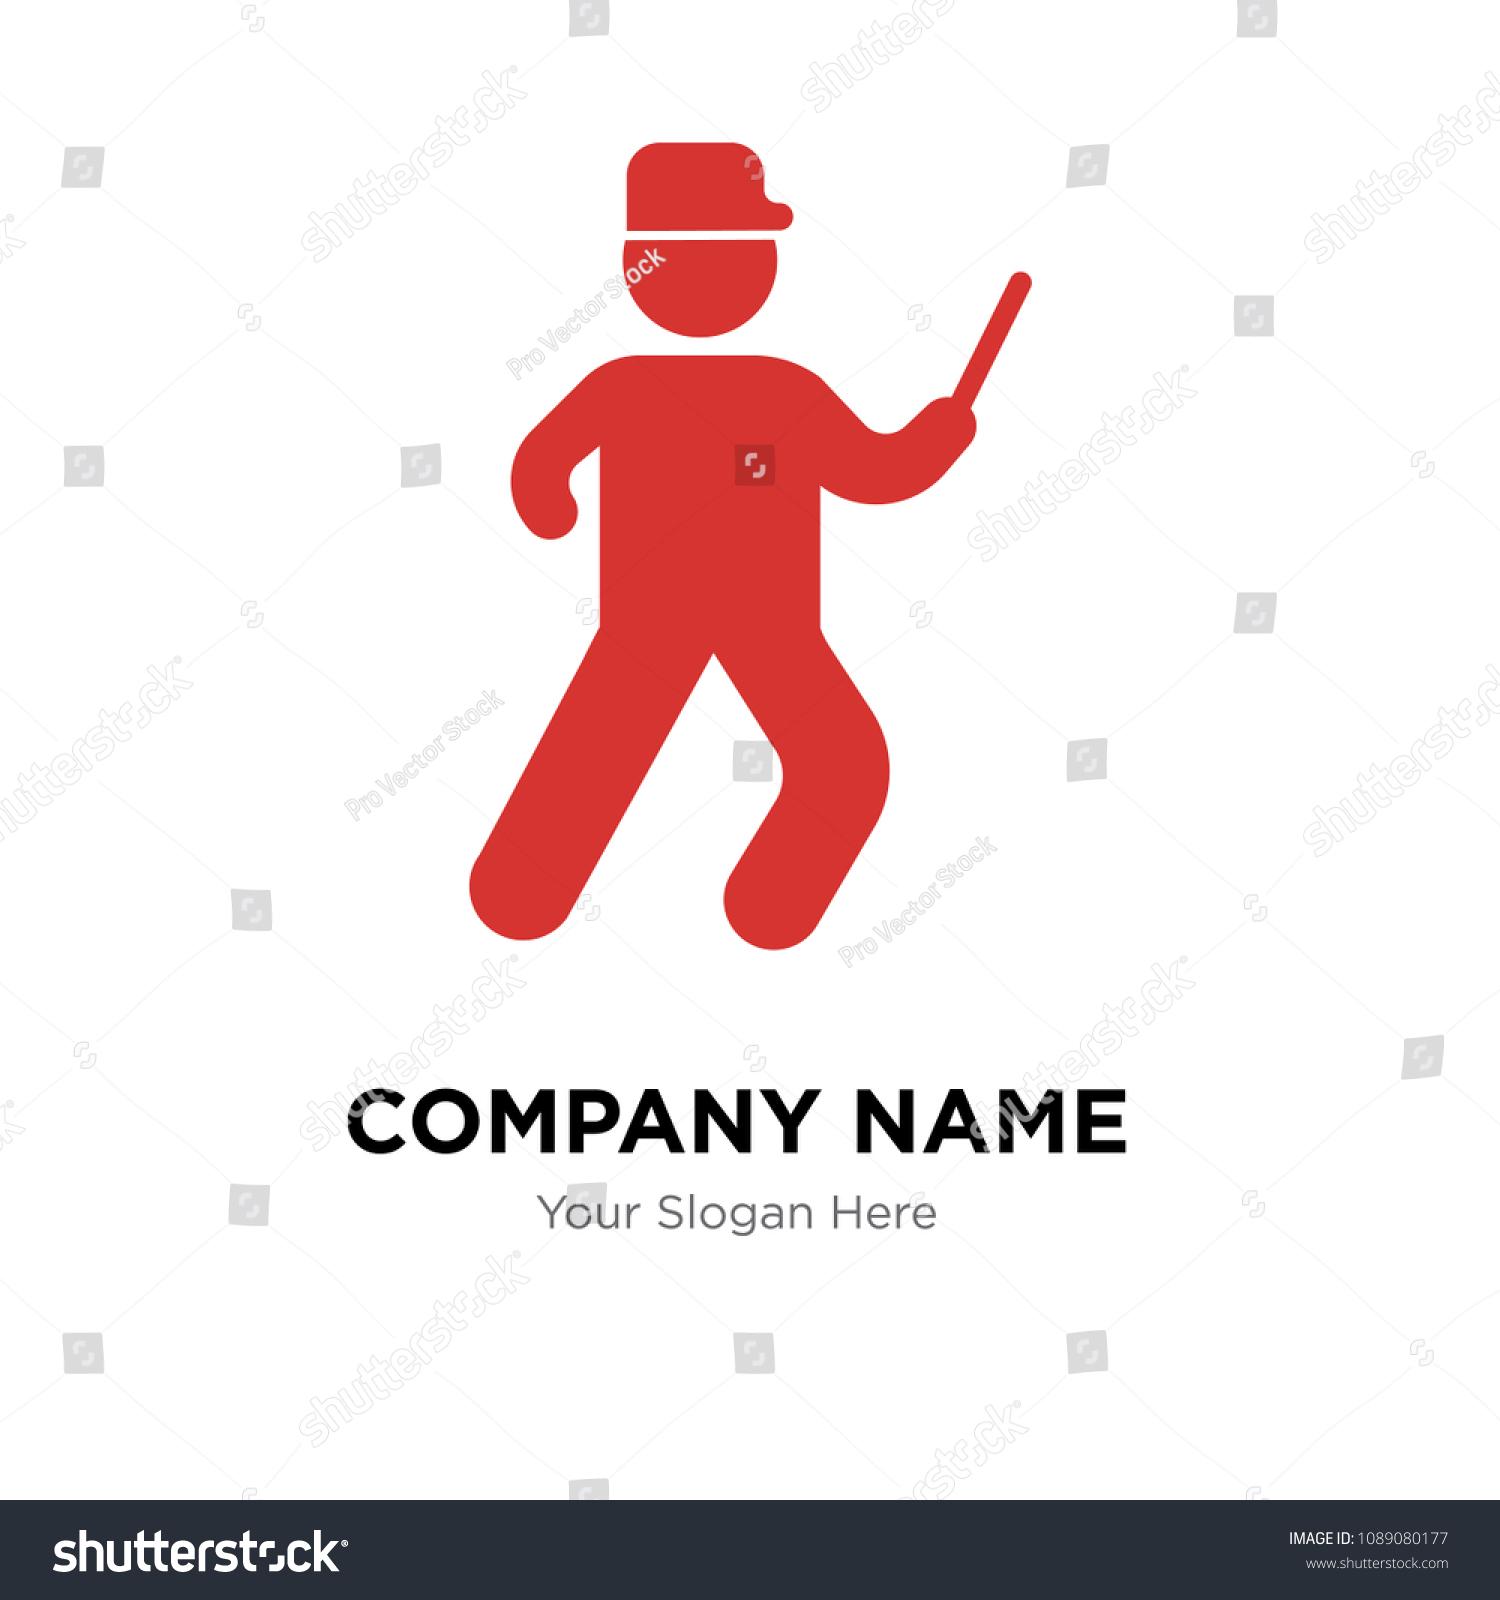 Running Cop Company Logo Design Template Stock Vector Royalty Free